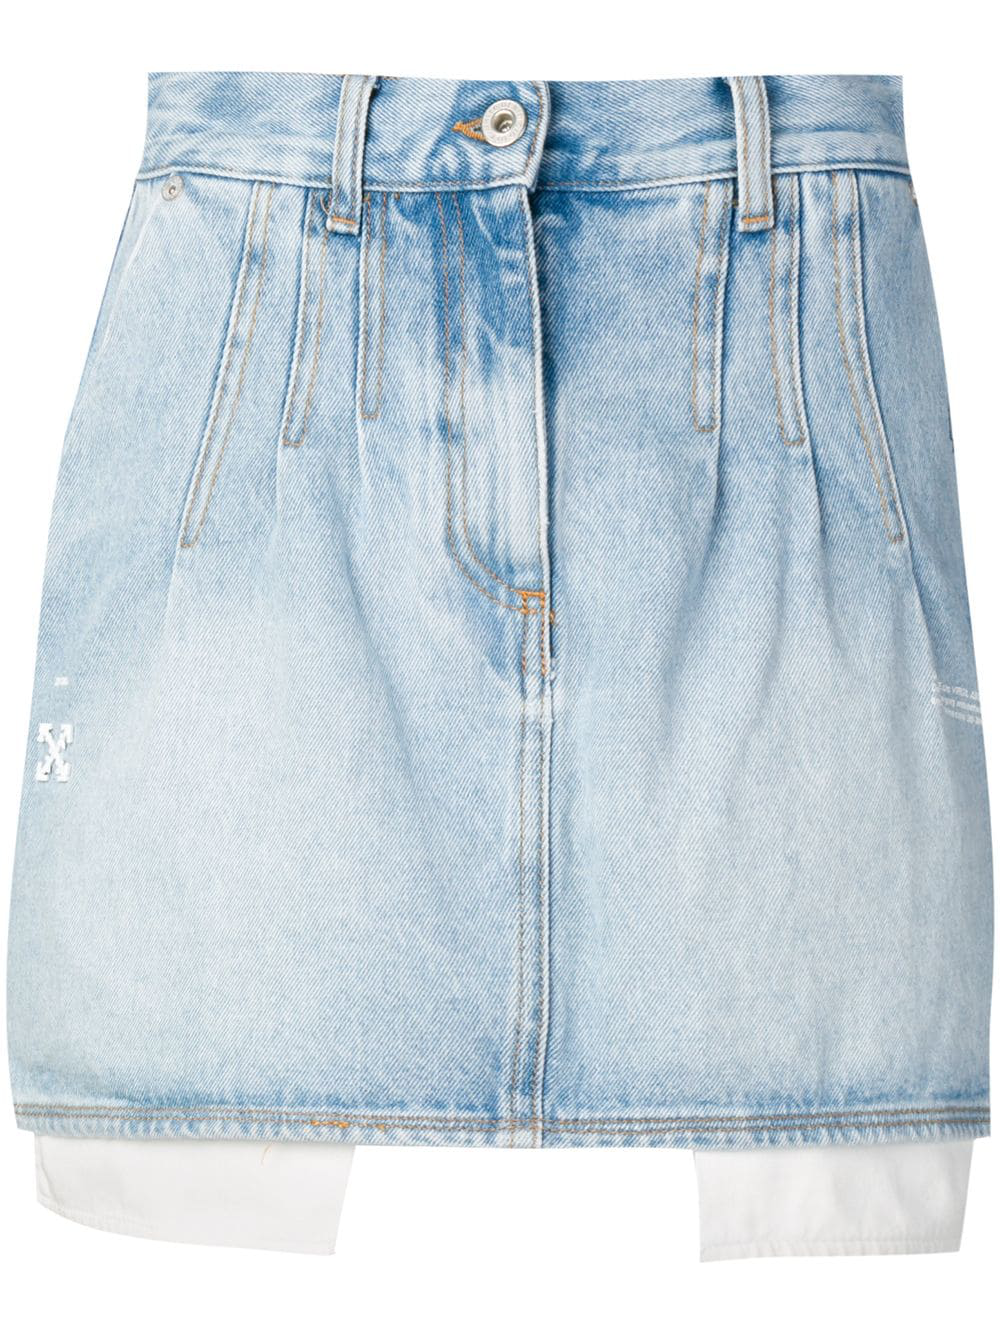 a45b25dc3cb3 Bleach Denim Mini Skirt in Blue